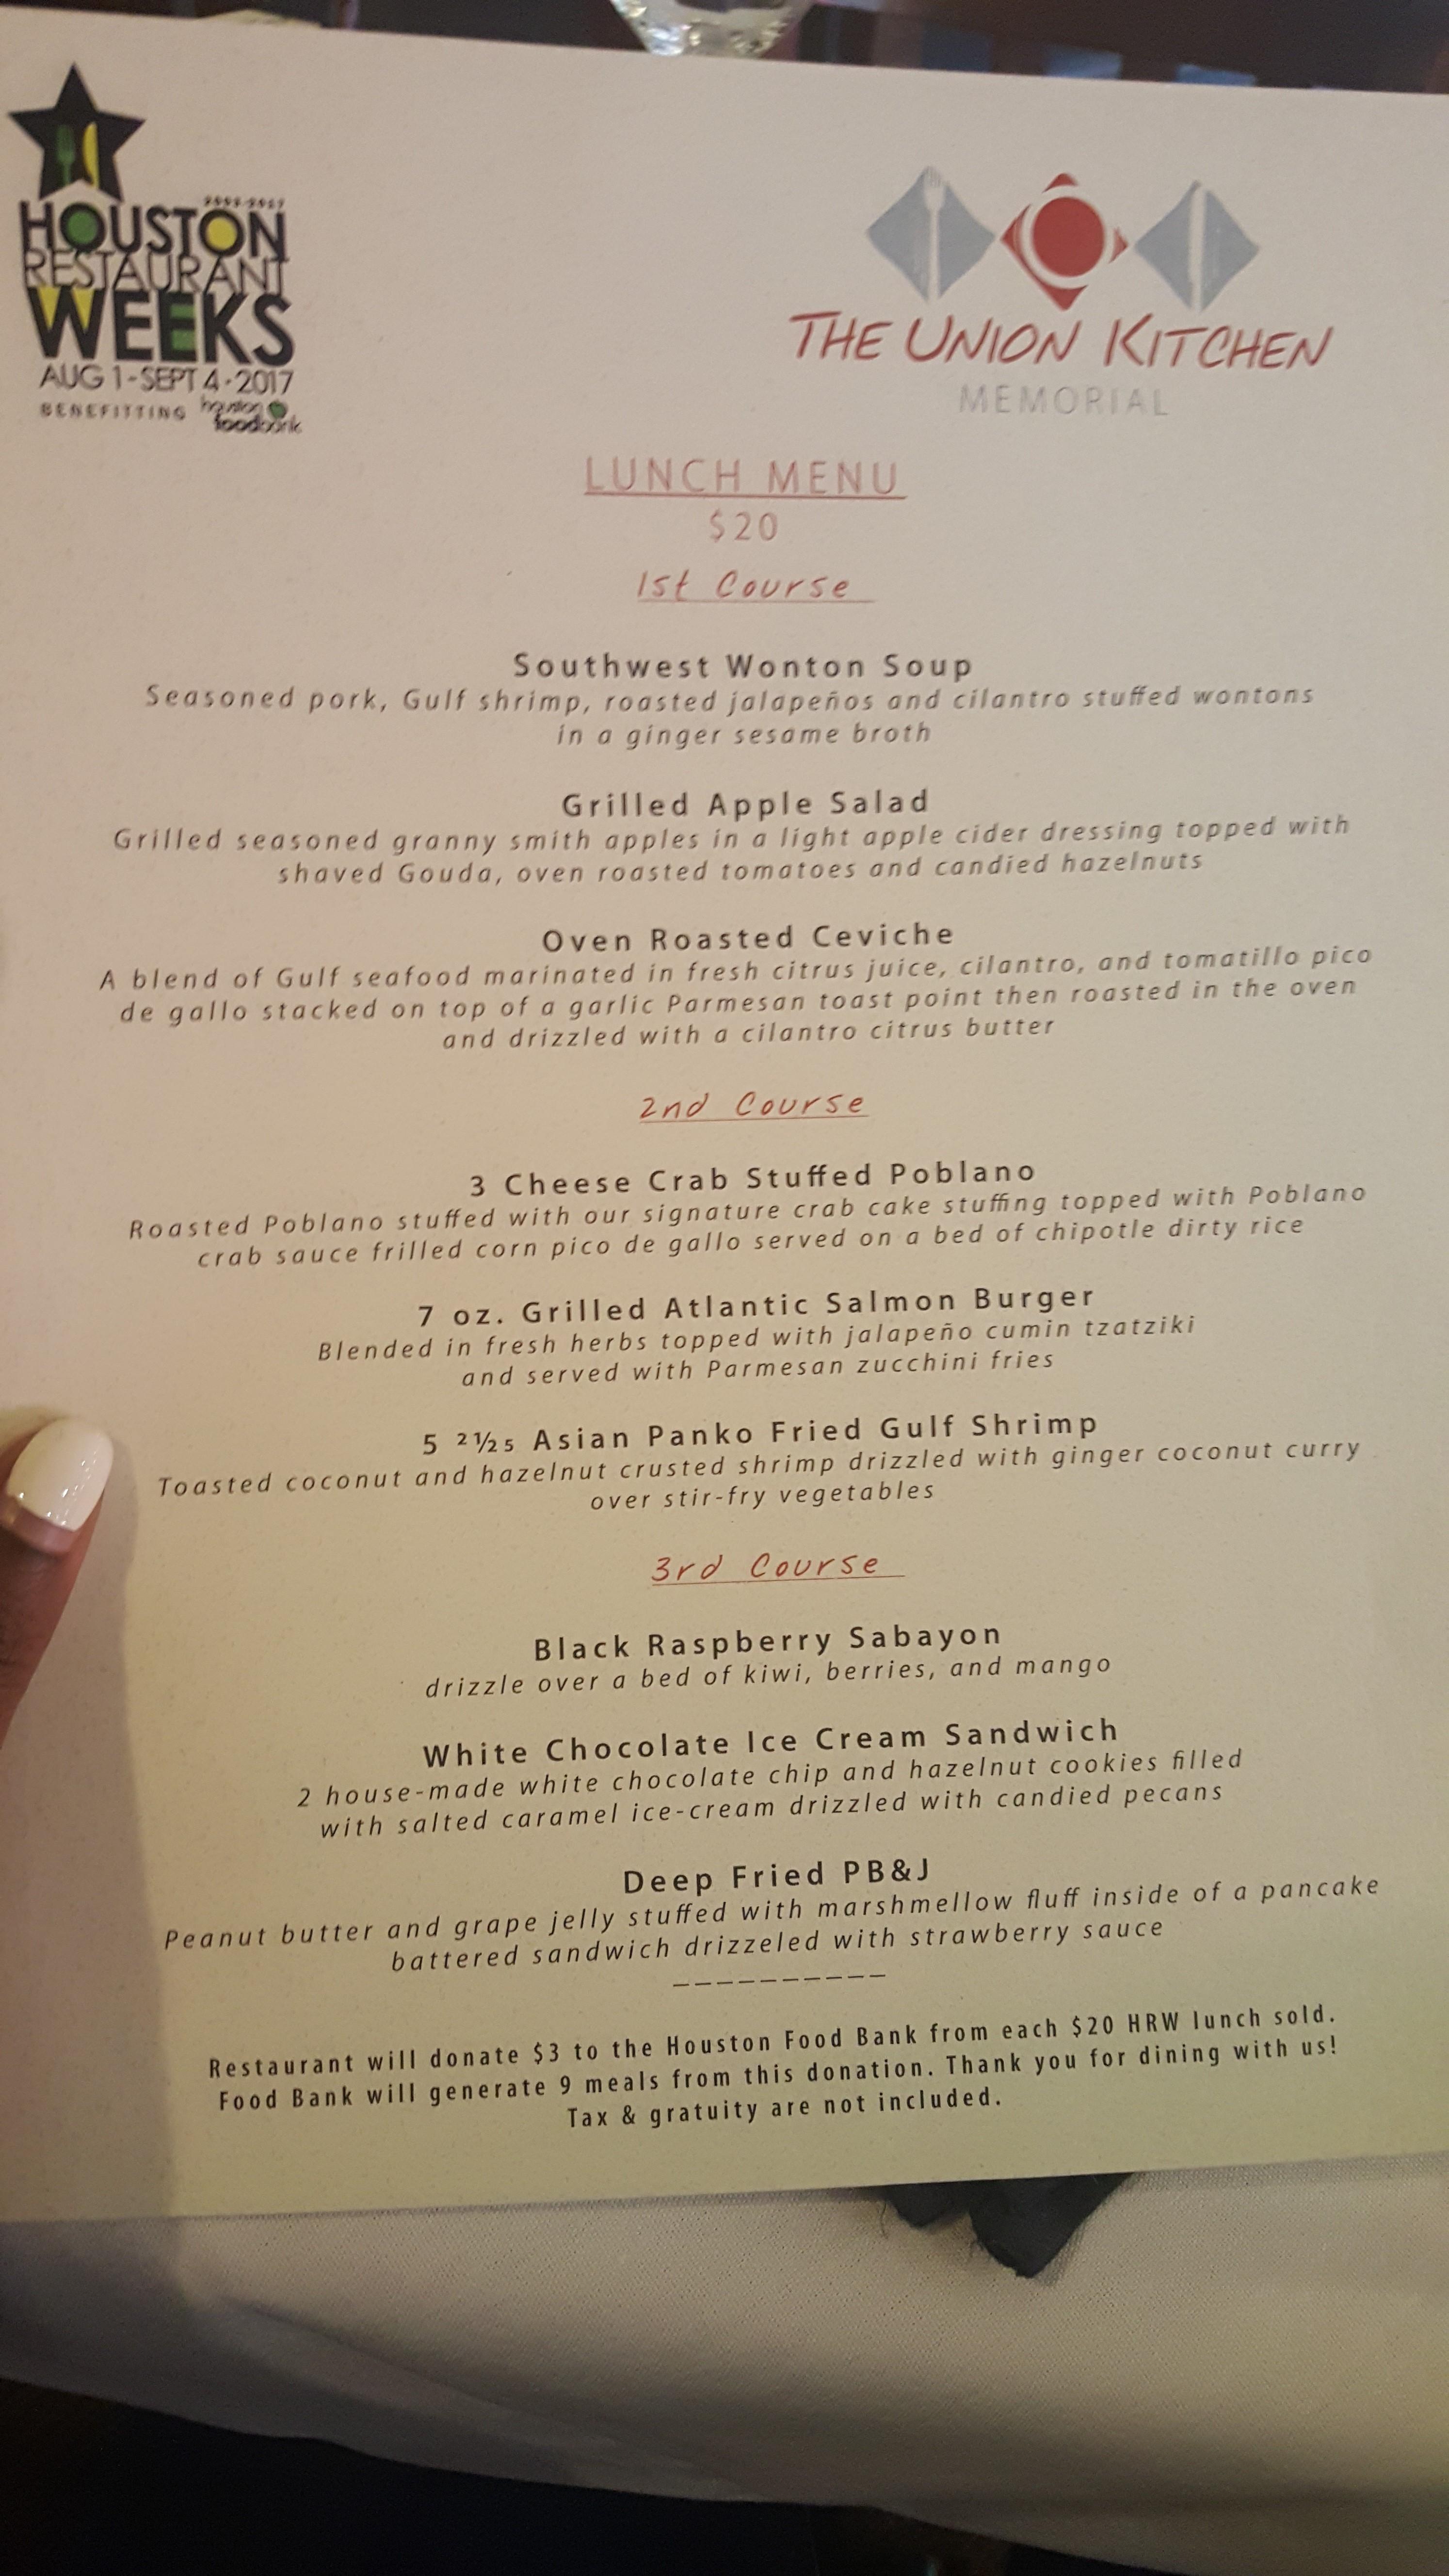 houston restaurant weeks review: union kitchen memorial